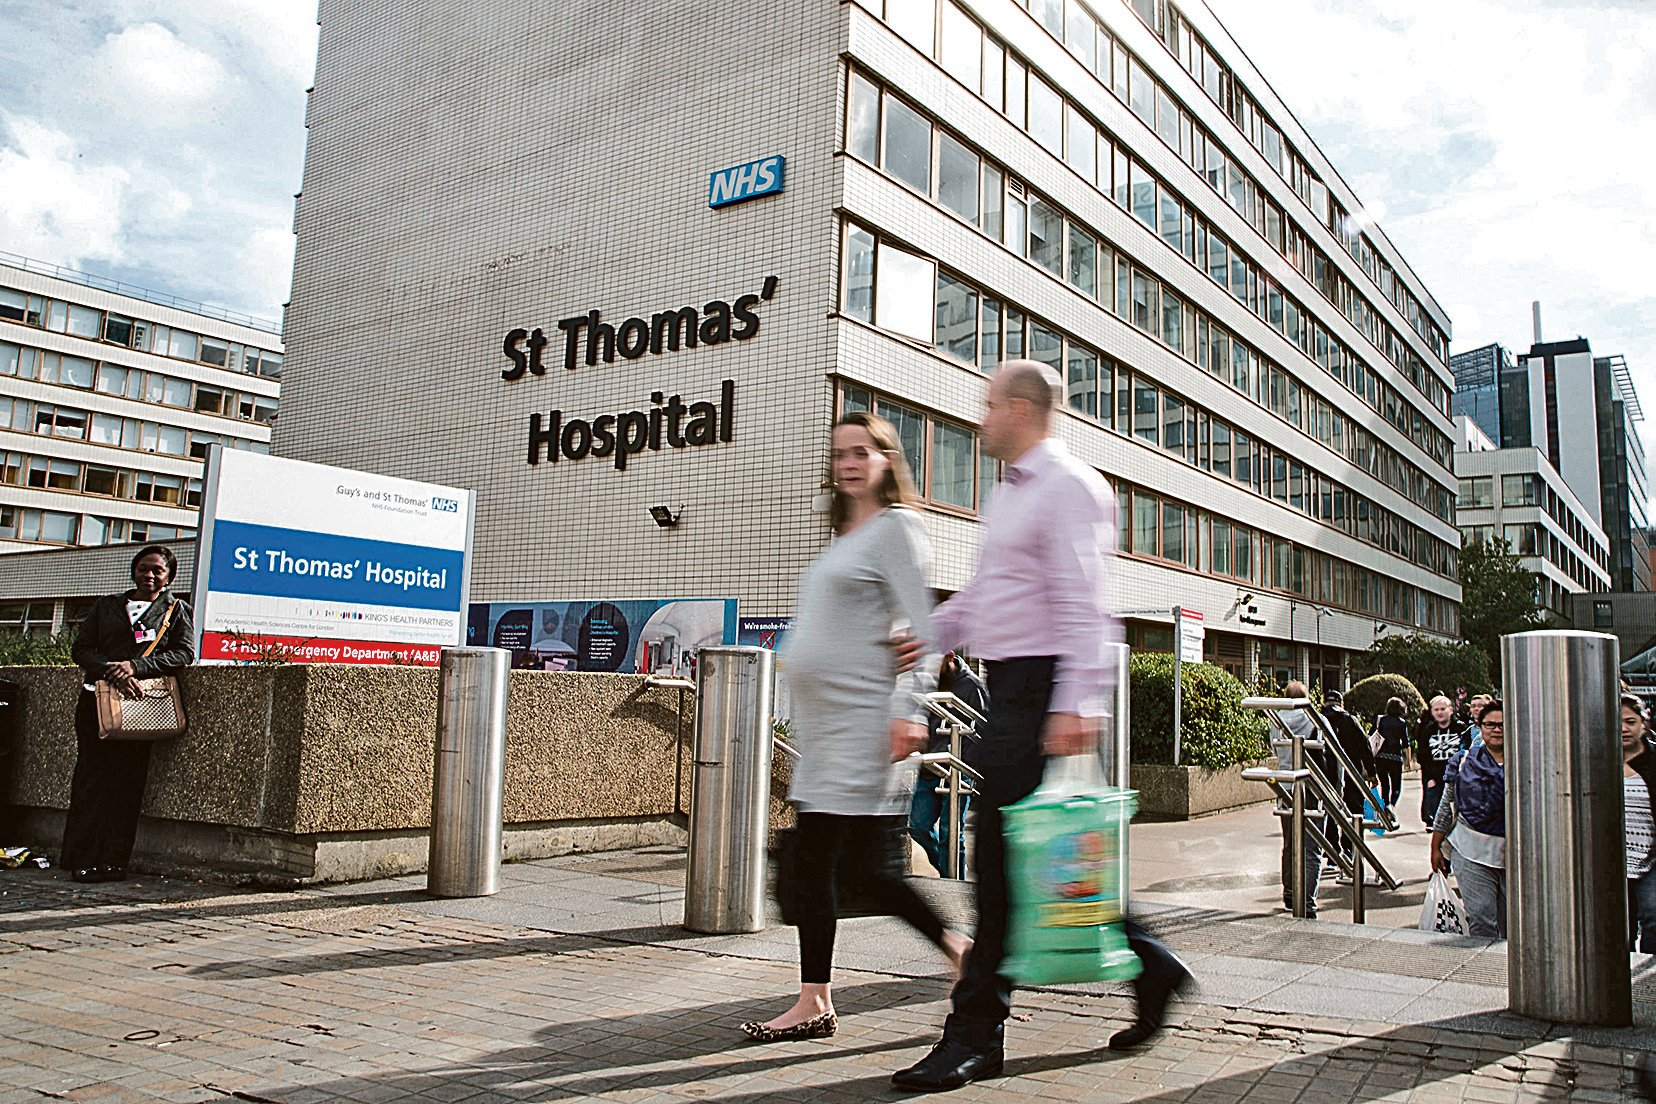 NHS為英國居民提供一系列的醫療保健服務,但這些服務並不完全向遊客開放。圖為英國的醫院。(Getty Images)